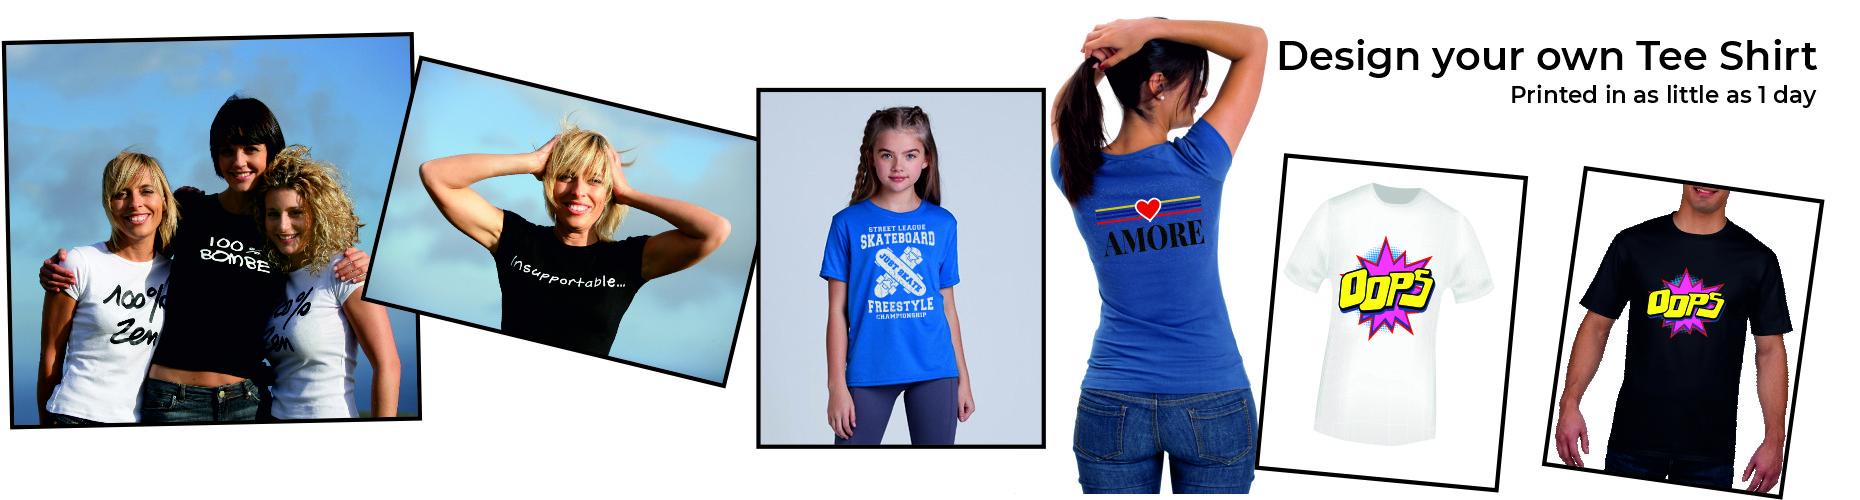 Custom printed personalised t shirts